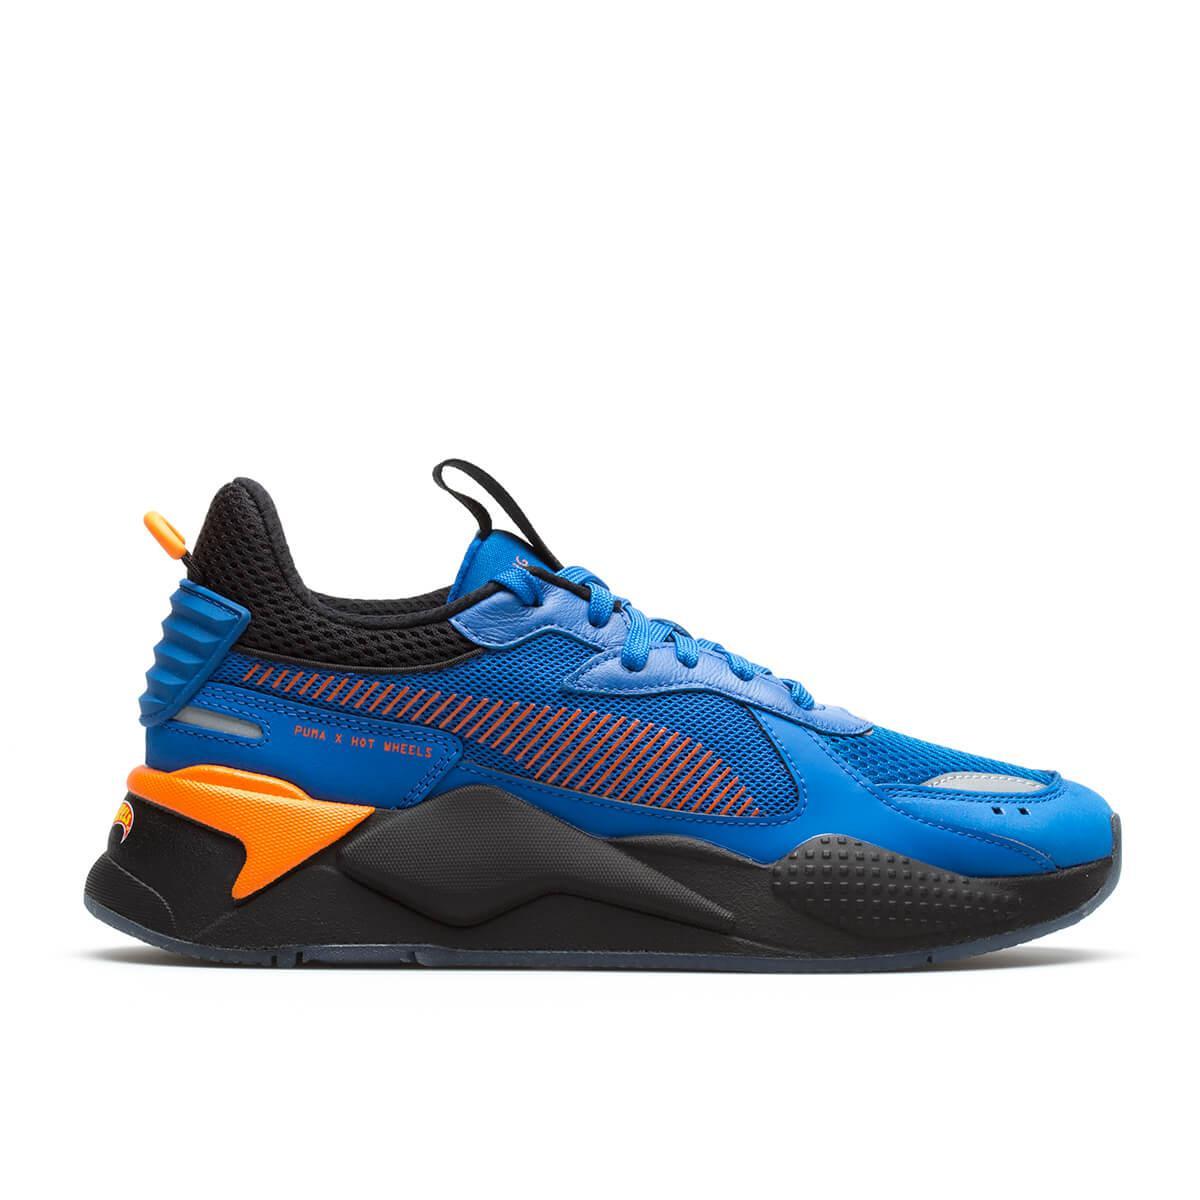 Lyst - PUMA Rs-x Toys Hot Wheels 16 in Blue for Men 1a6c0de82